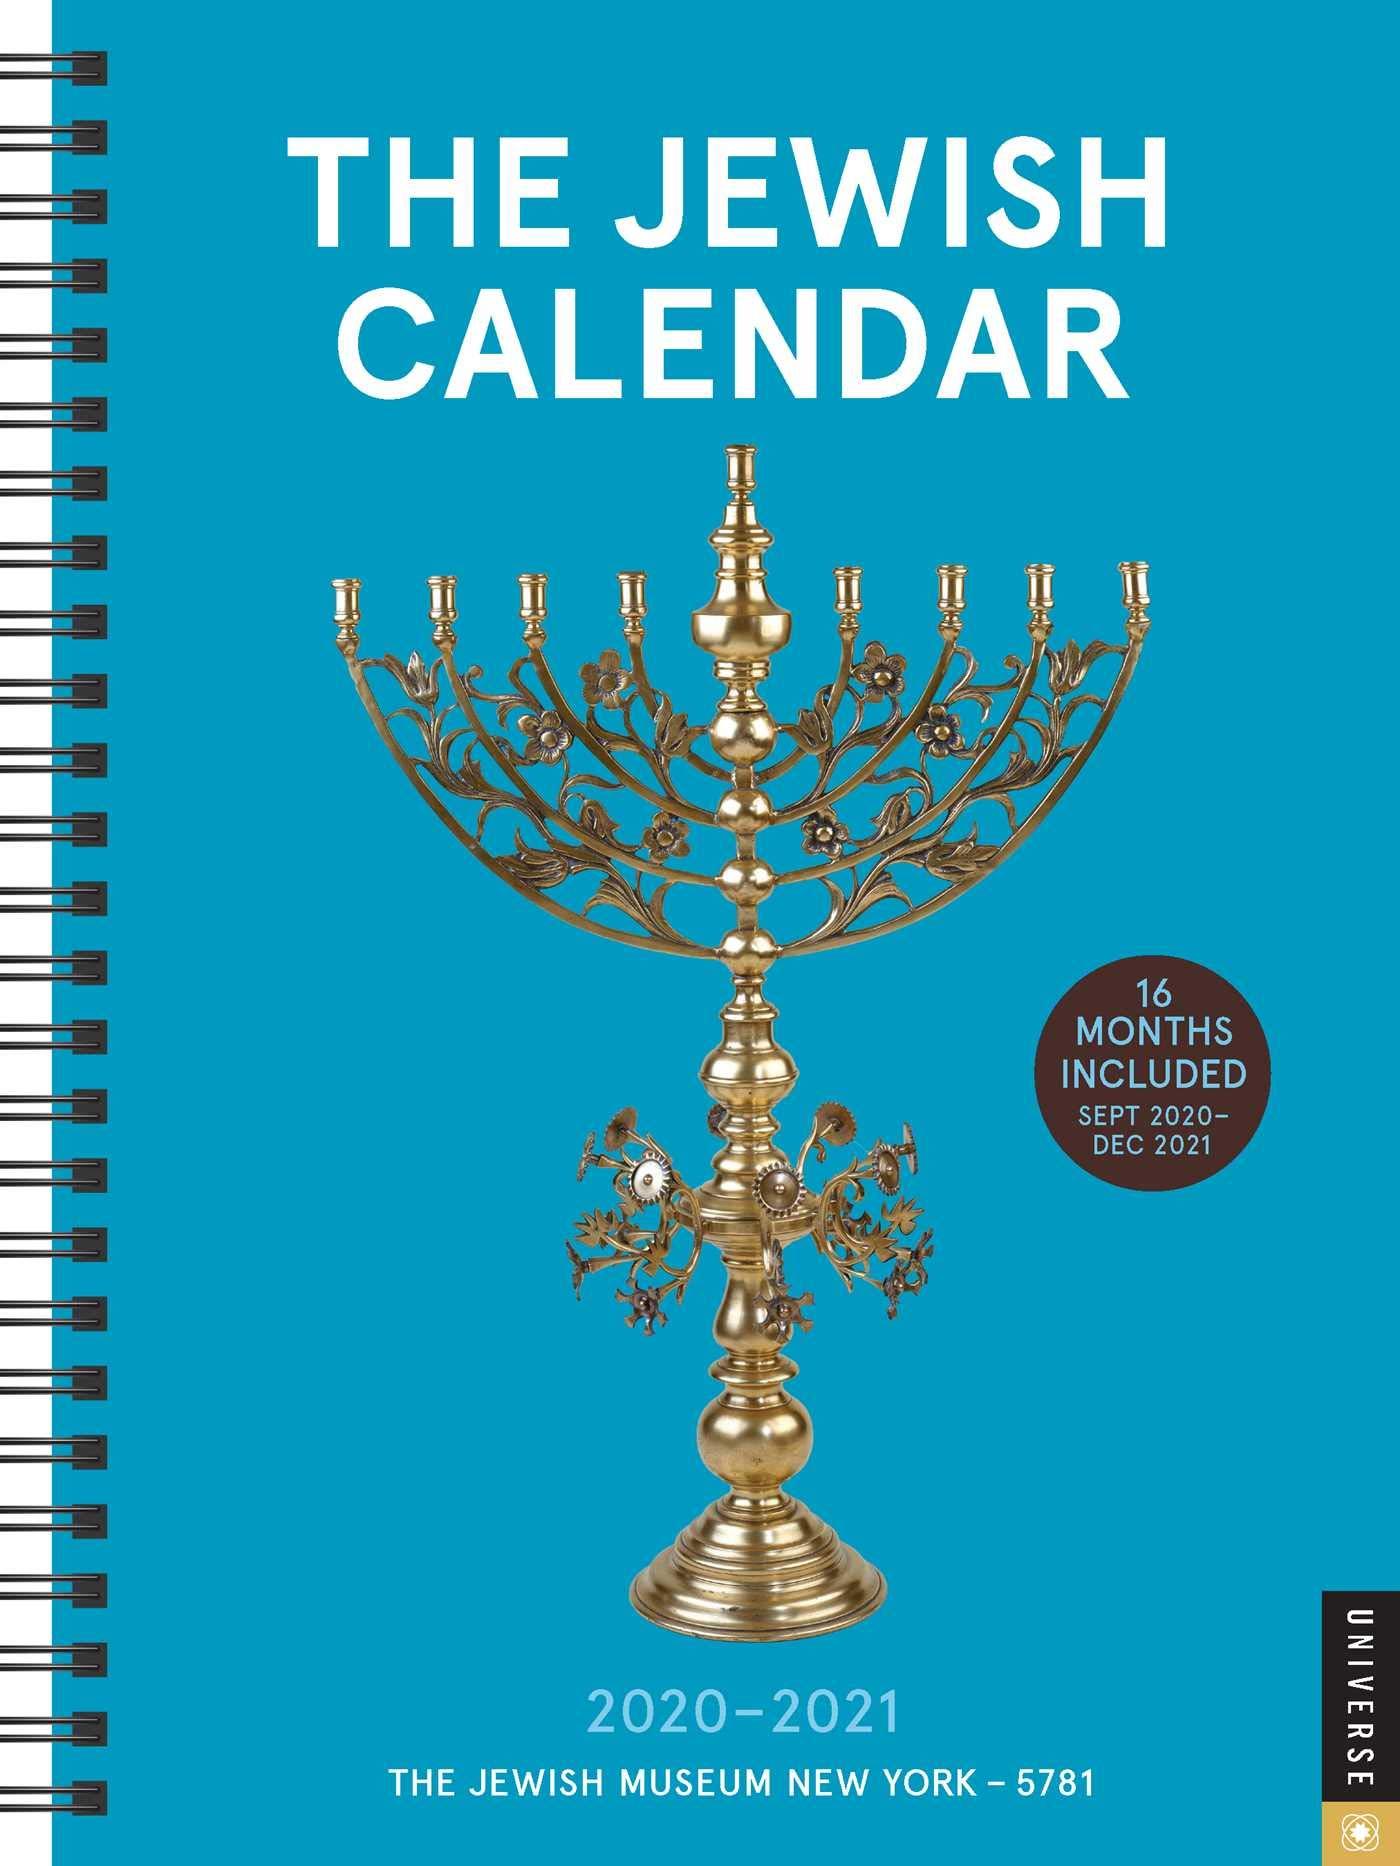 2021 Calendar With Jewish Holidays The Jewish Calendar 16 Month 2020 2021 Engagement Calendar: Jewish